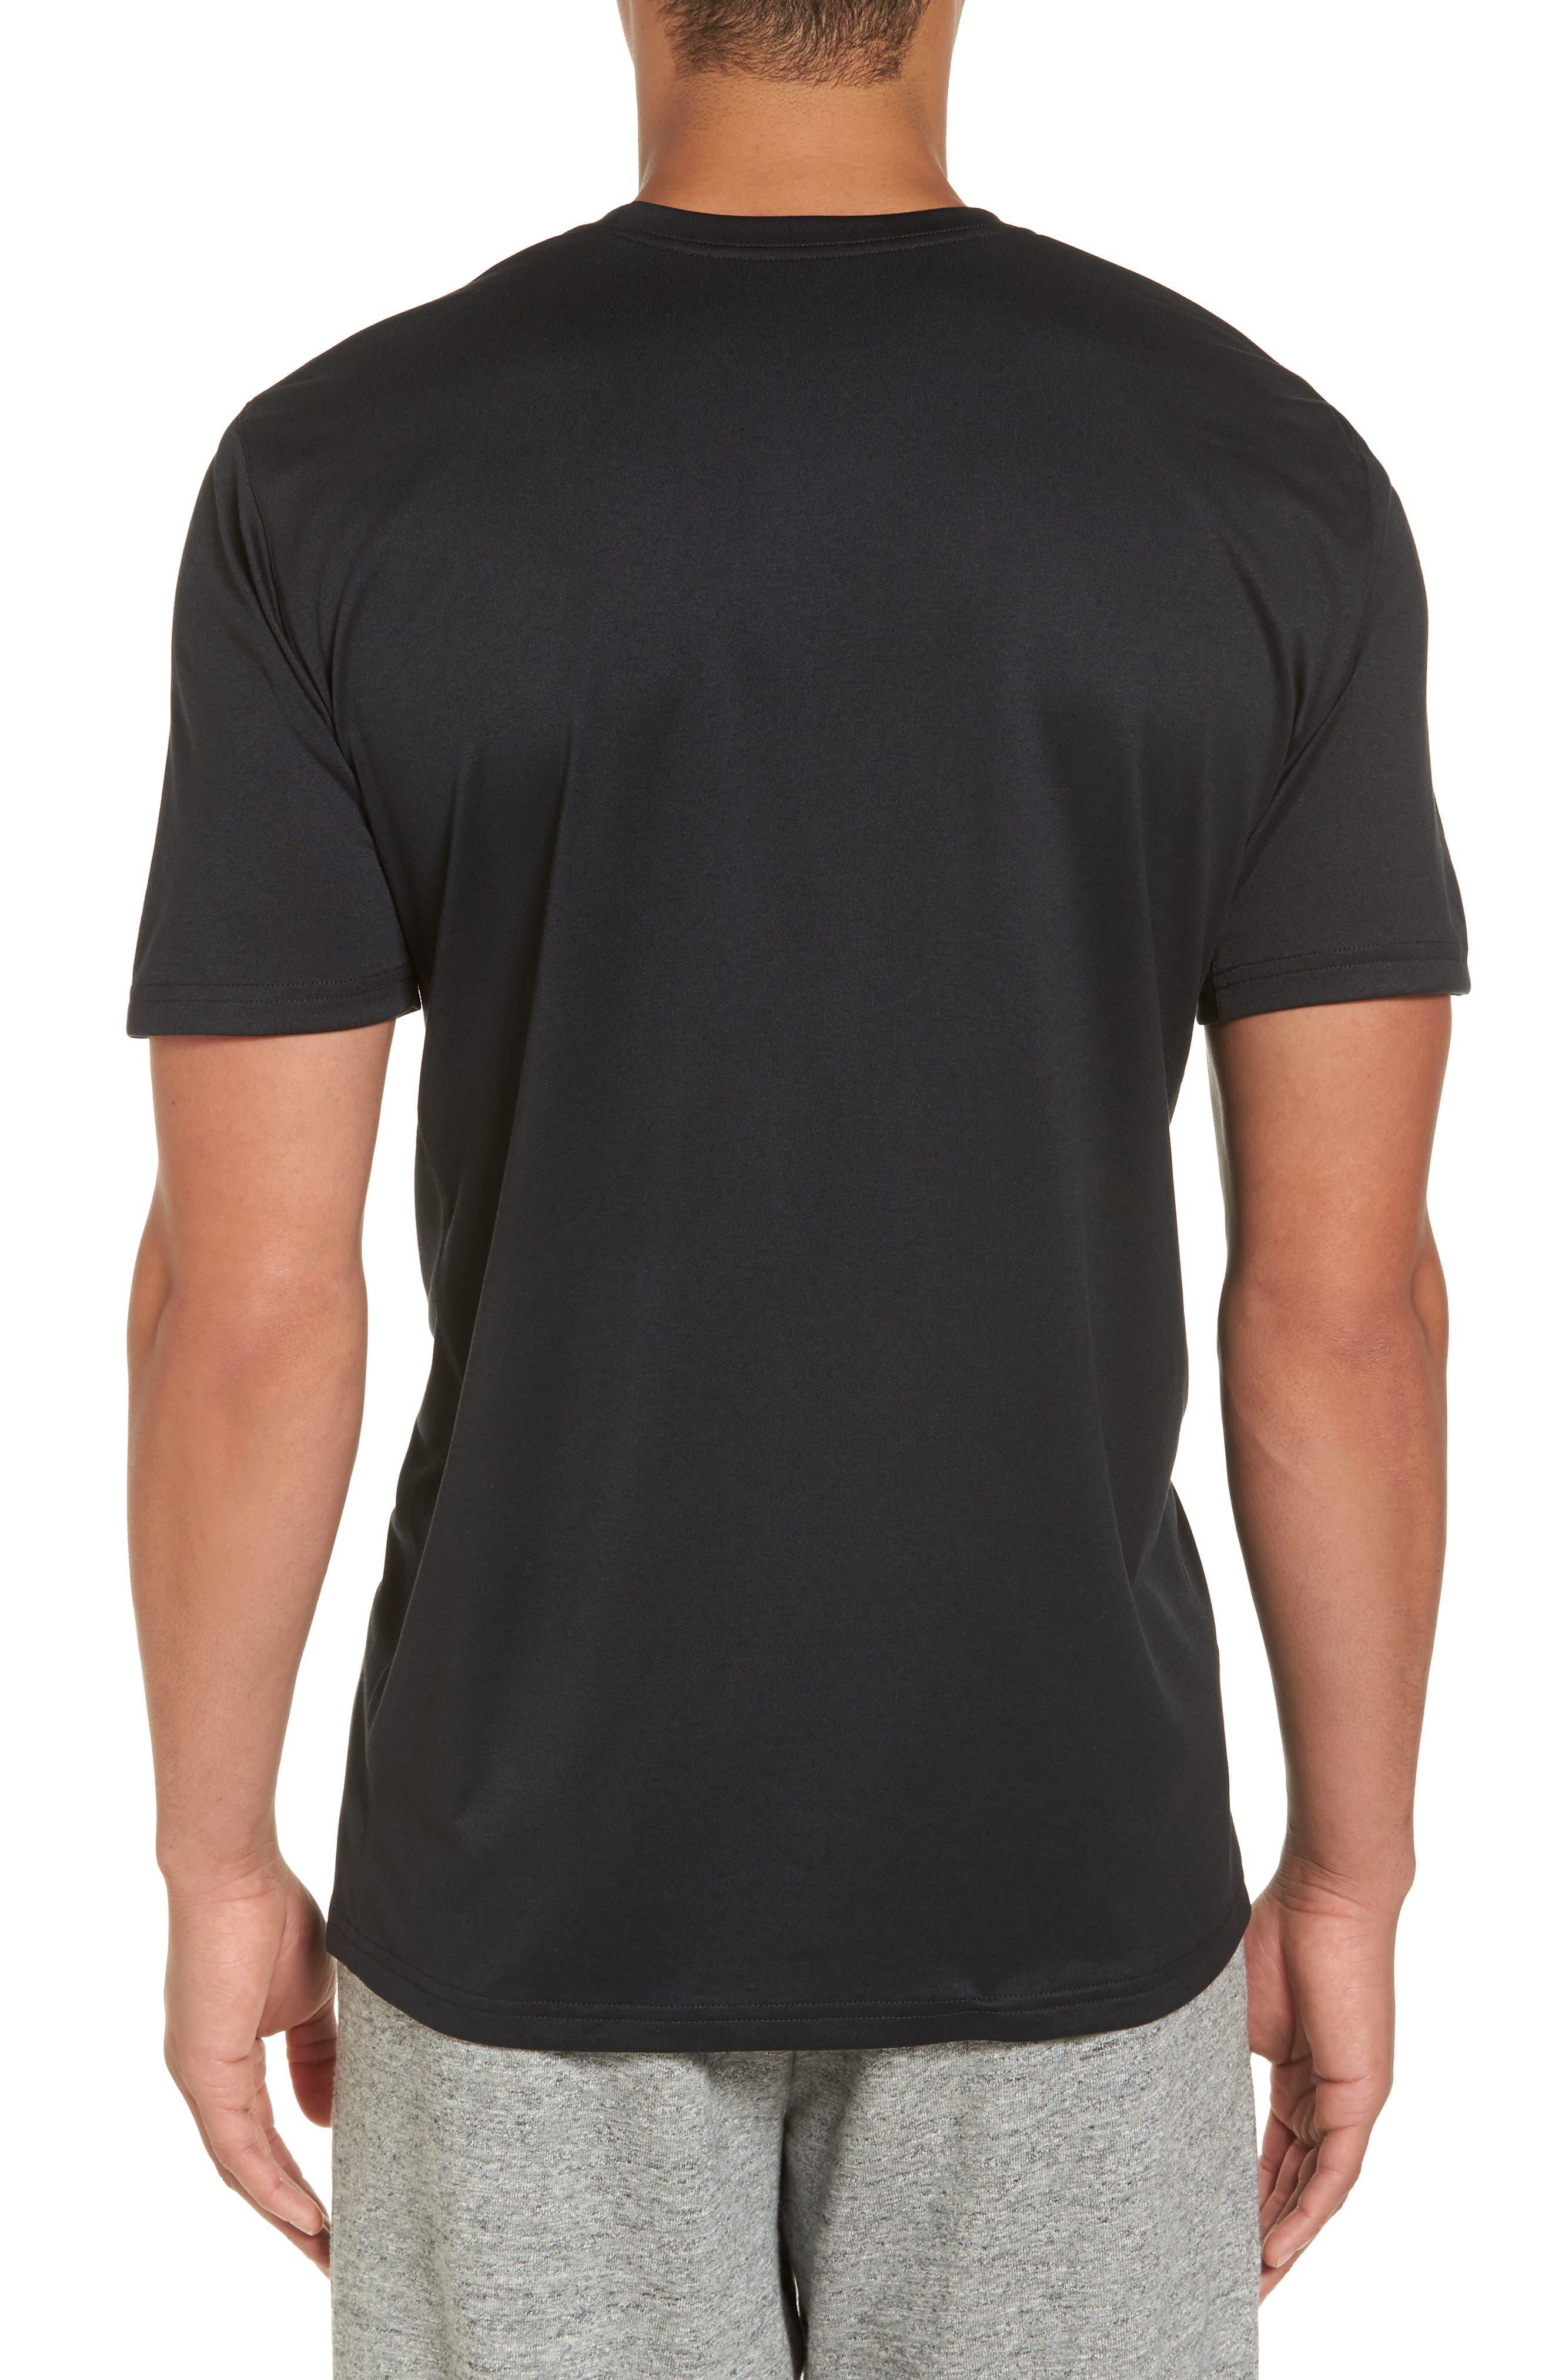 Dry Legend Training T-Shirt,                             Alternate thumbnail 2, color,                             010